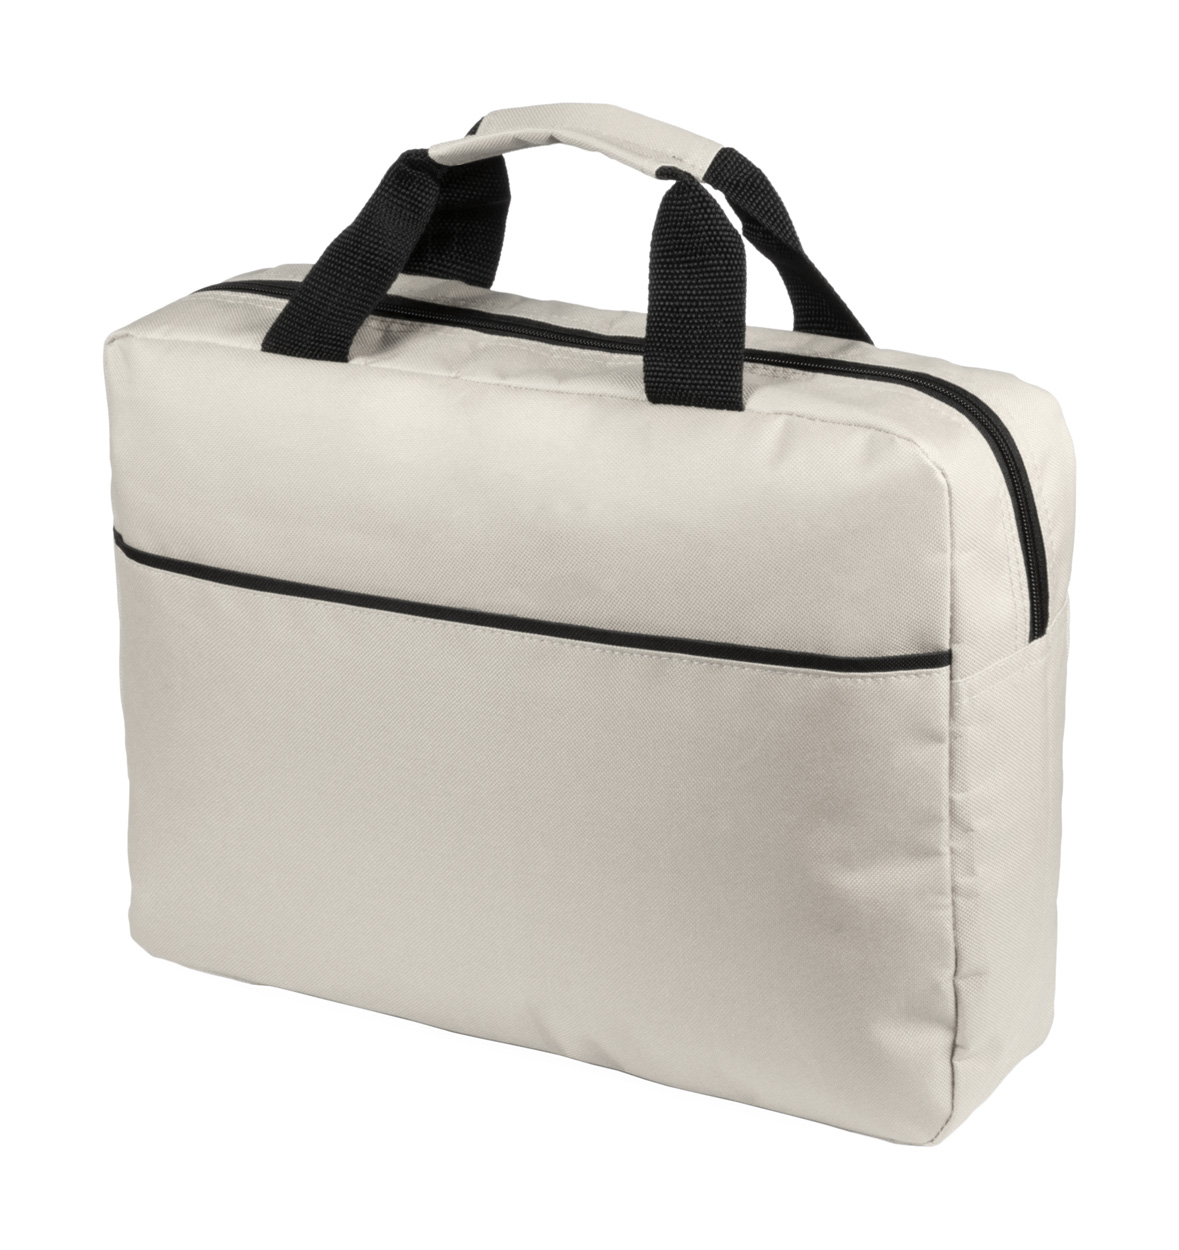 Hirkop document bag